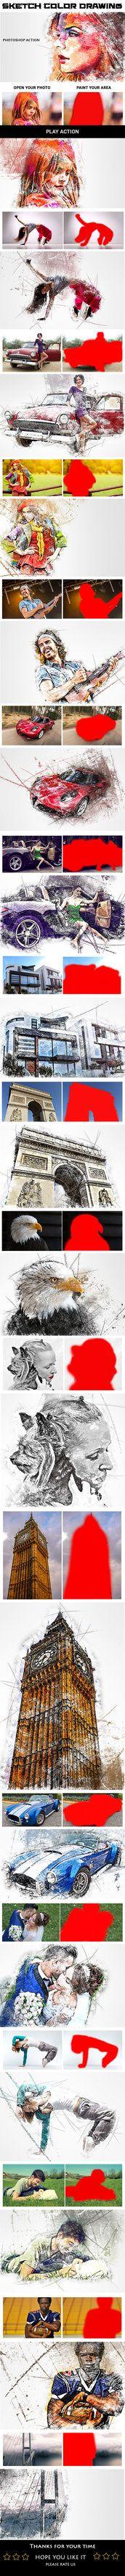 DOWNLOAD:    goo.gl/2CBi2nSketch Color Drawing Photoshop ActionAn Amazing Sketch Color Drawing Photoshop Action with professional Photoshop actions.Photoshop Configure...